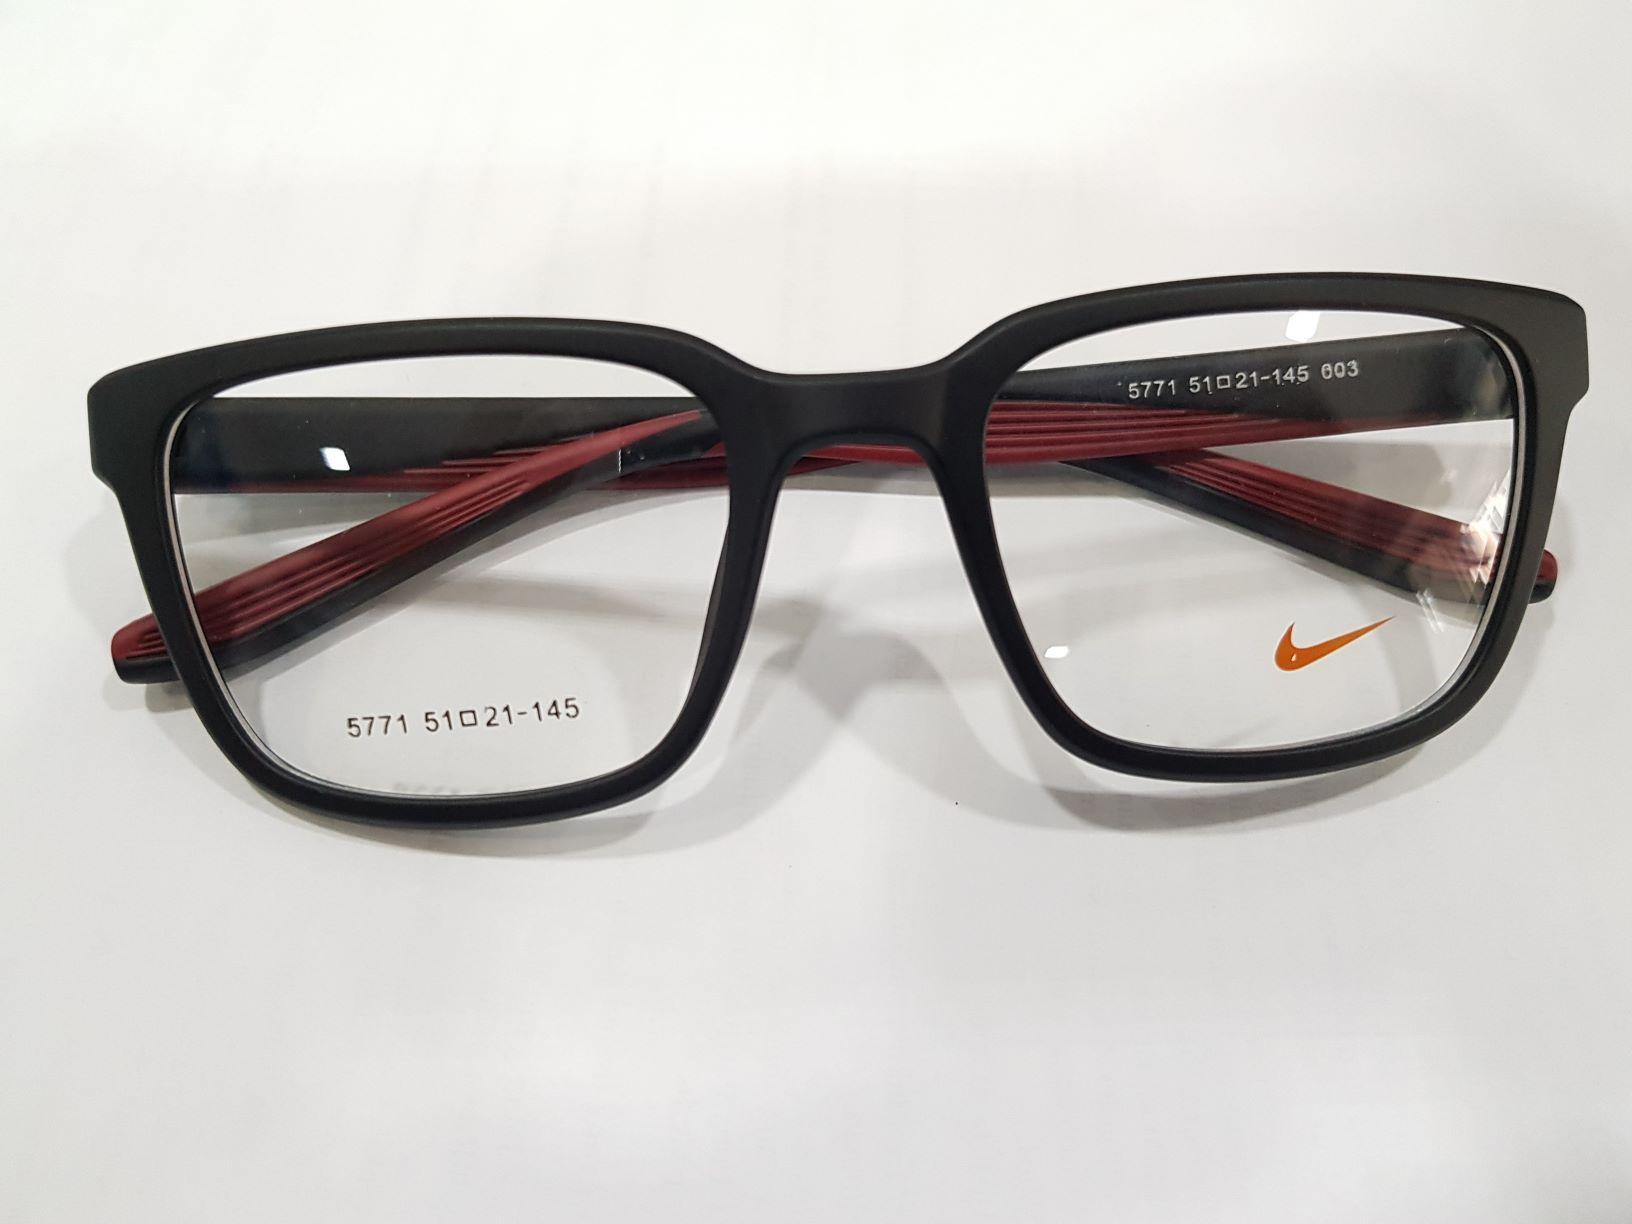 Frame kacamata Nike sport design + Lensa minus anti radiasi a736c7e3a5